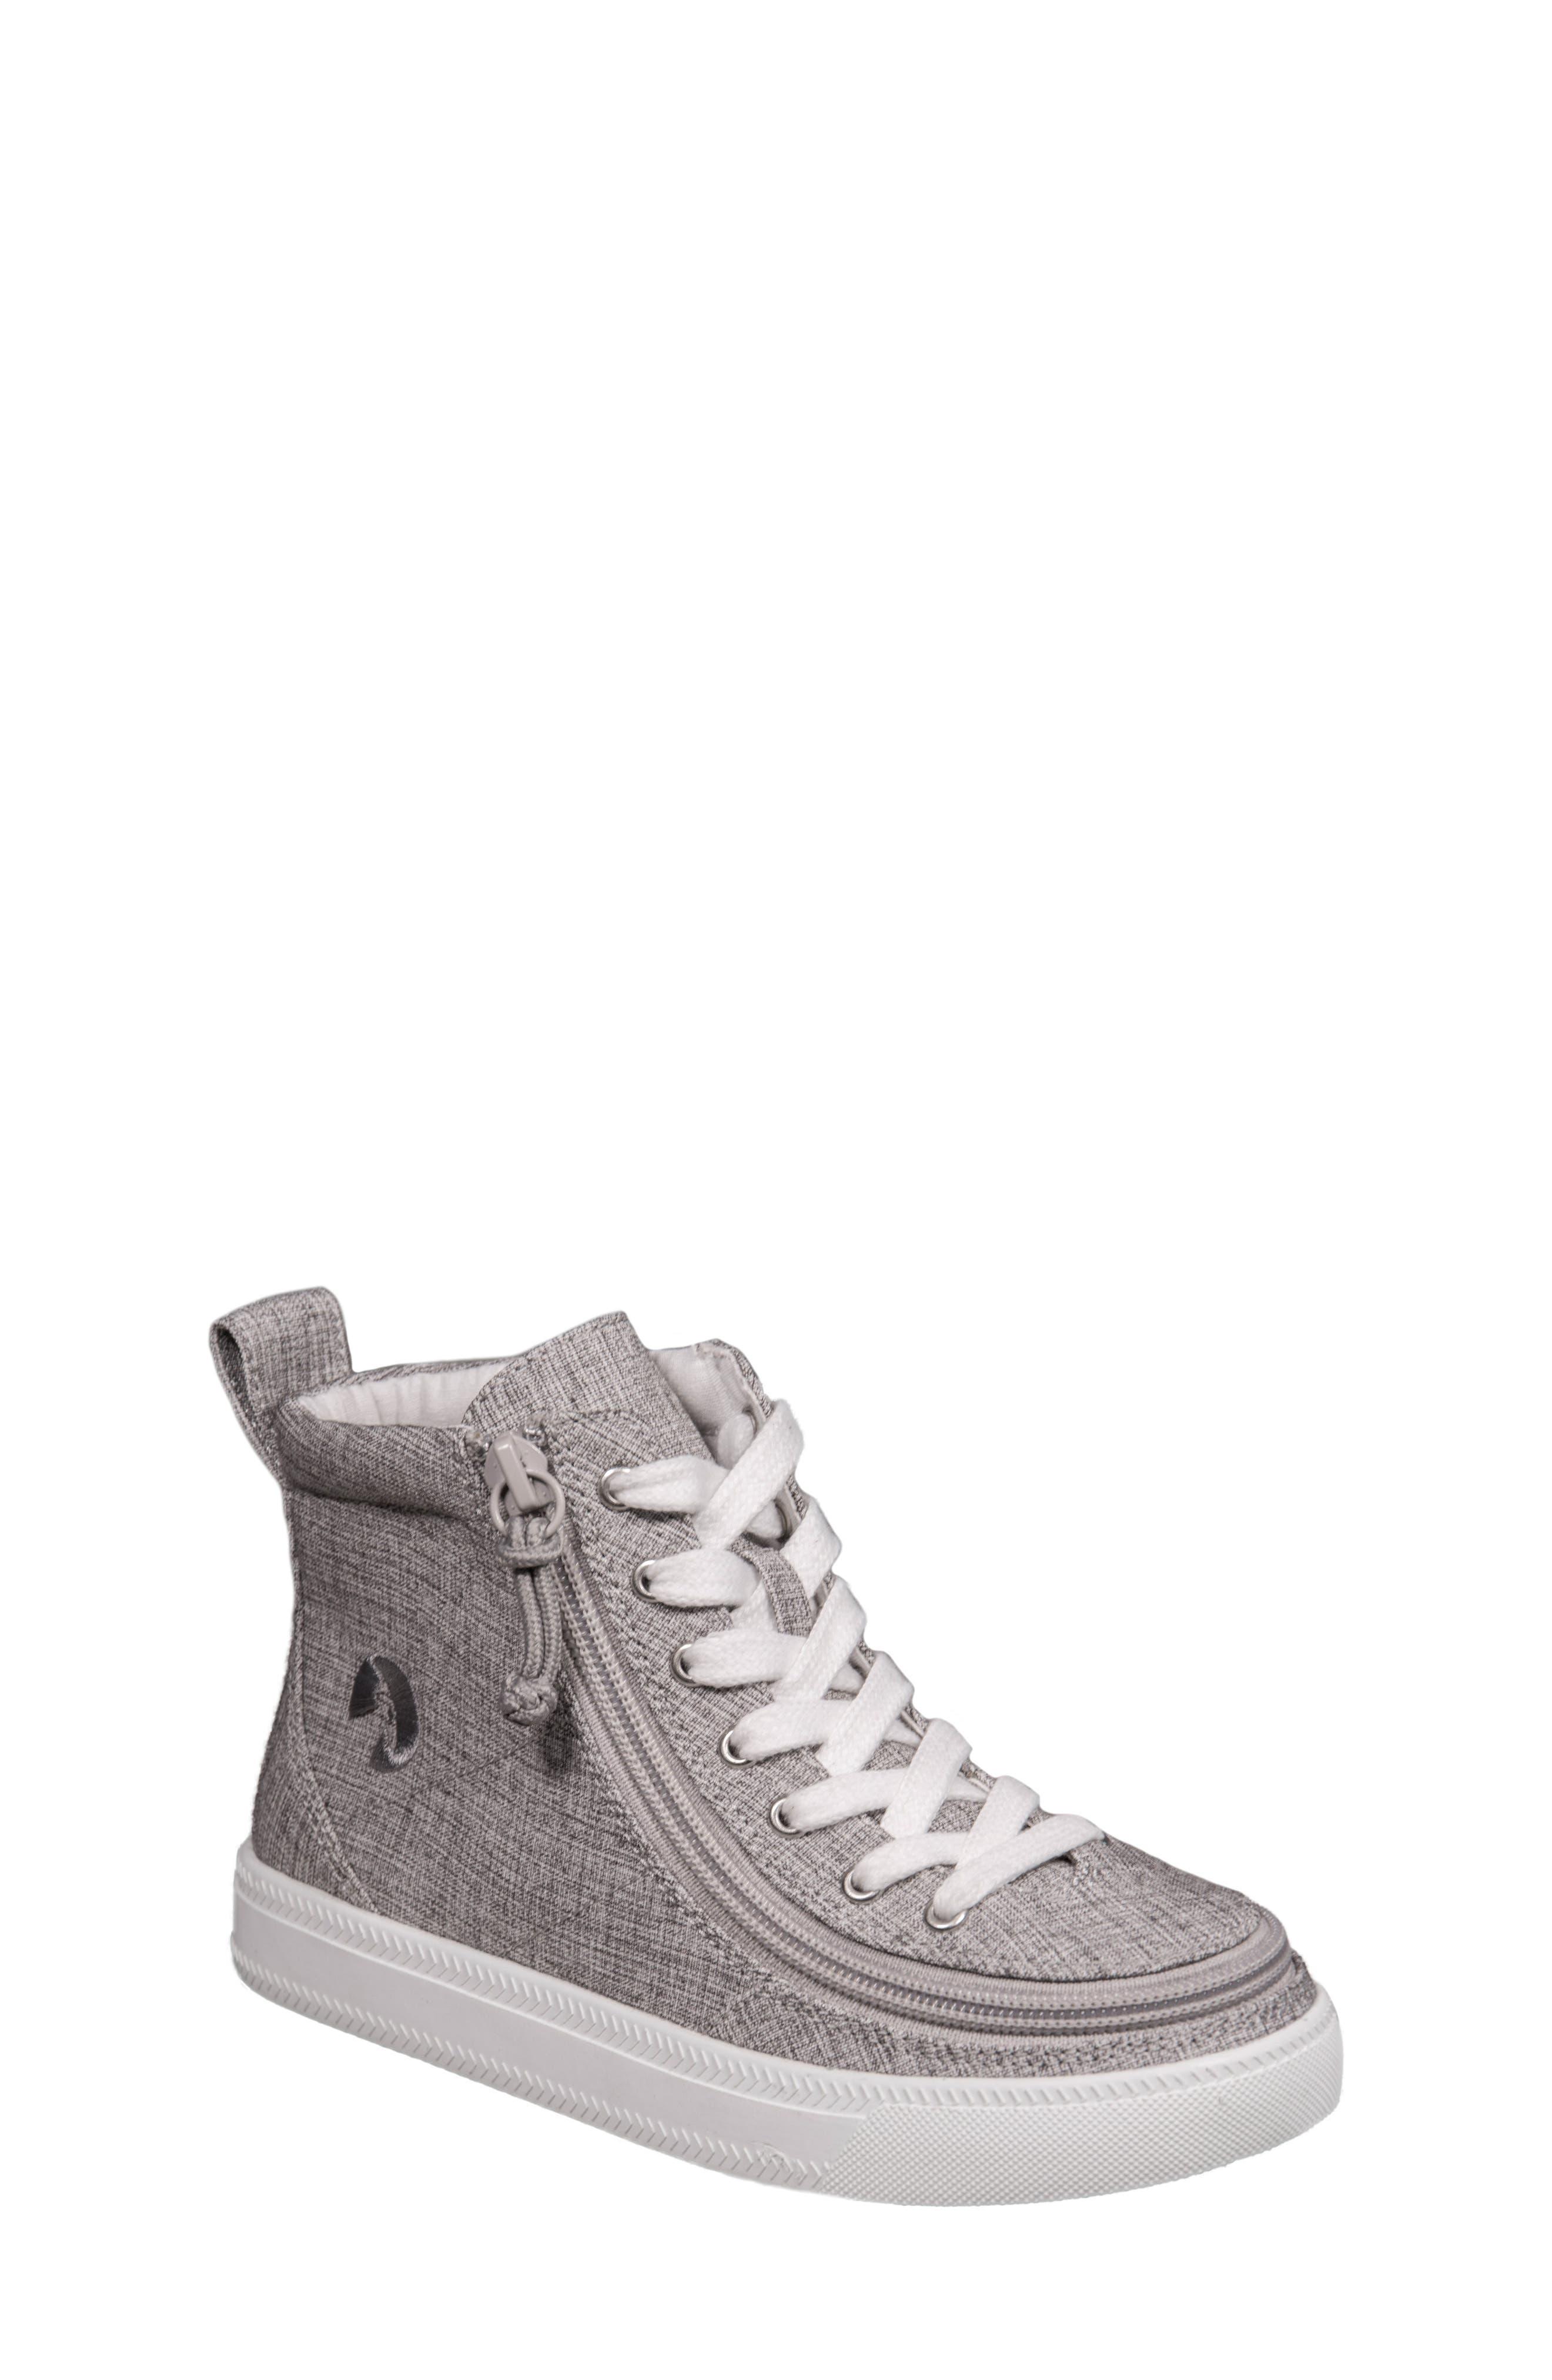 BILLY Footwear Zip Around High Top Sneaker (Toddler, Little Kid & Big Kid)